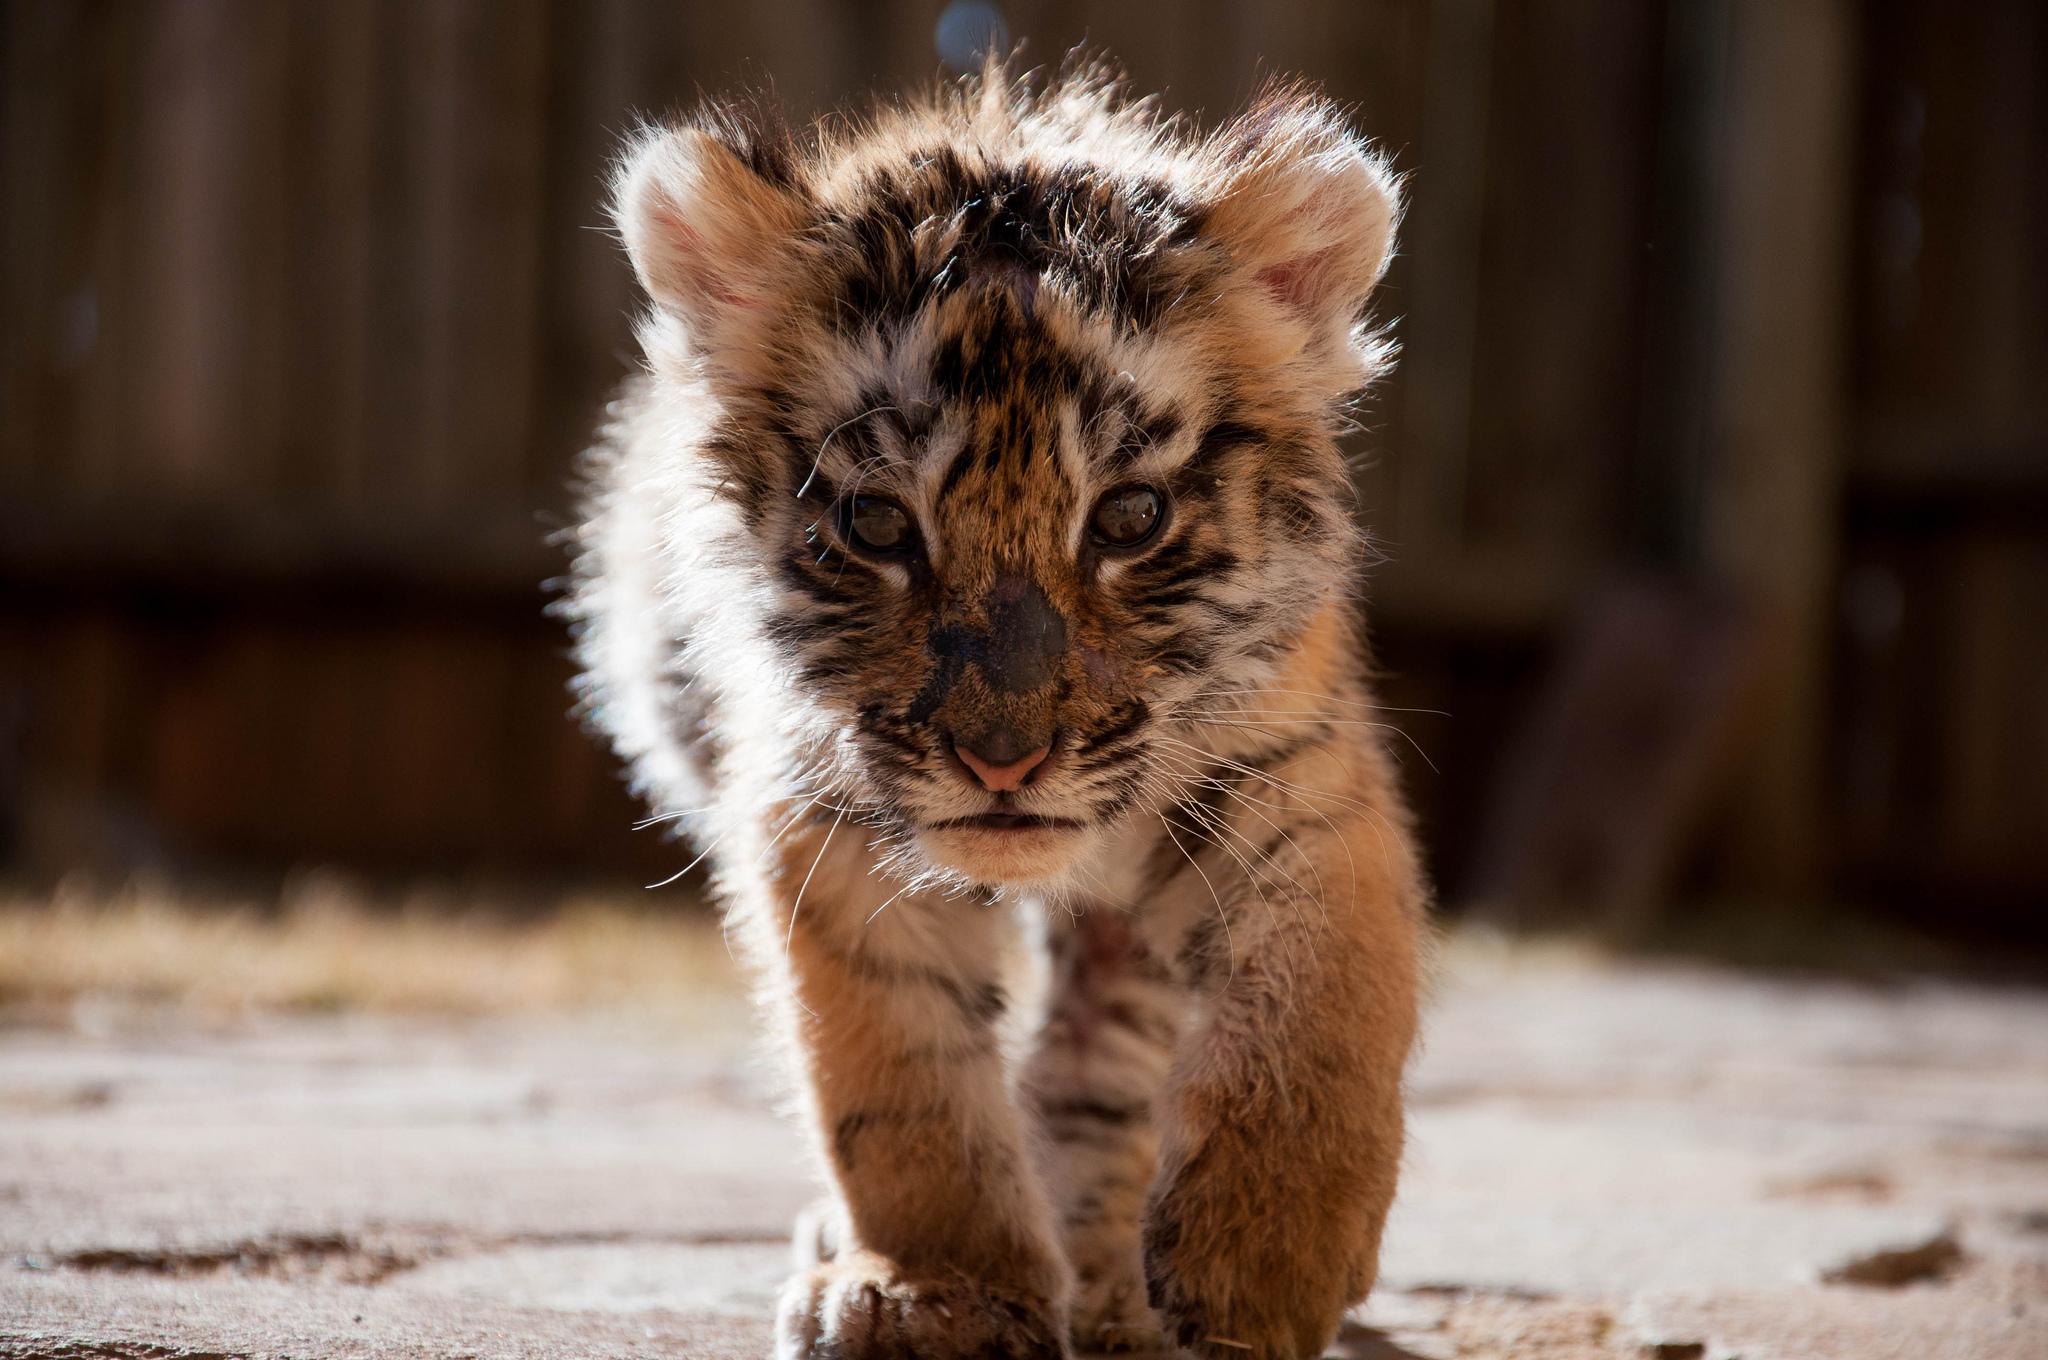 Baby siberian tiger wallpaper - photo#21